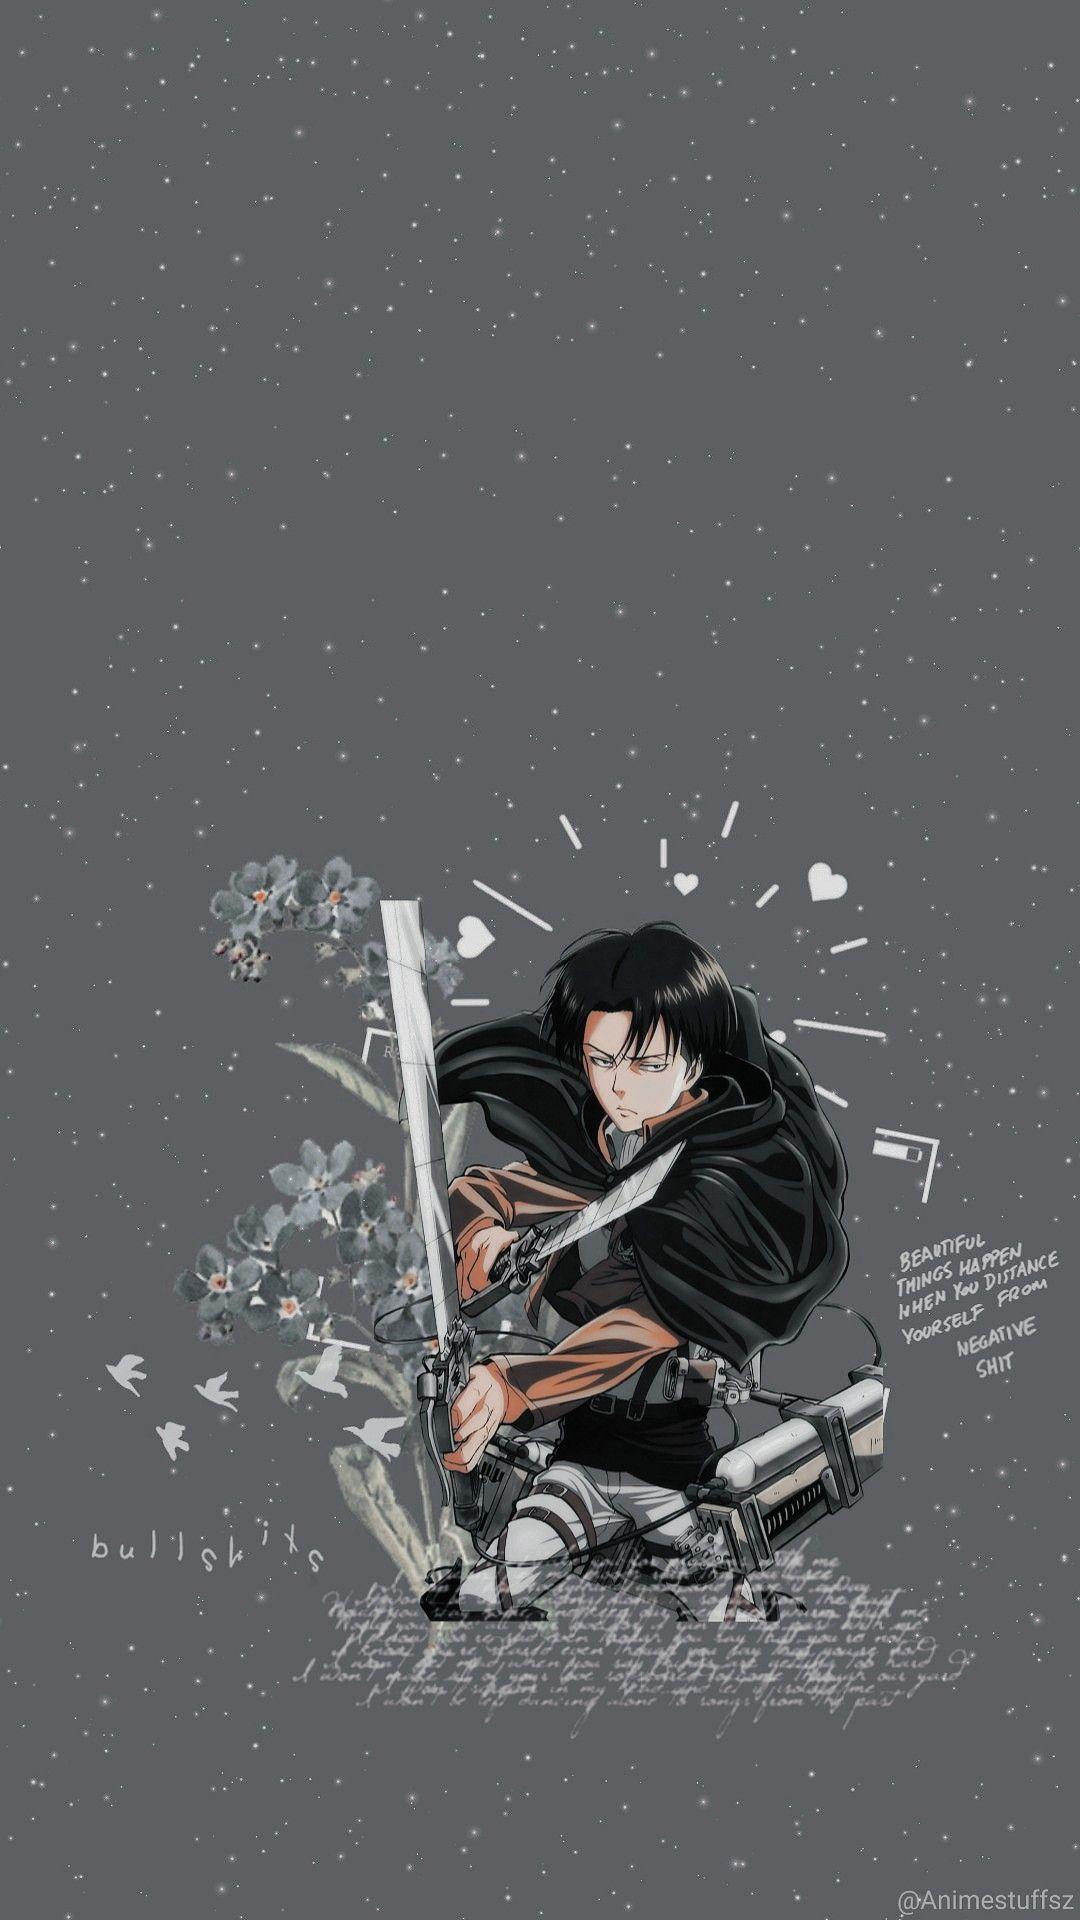 Epingle Par Risa Cartoon Sur Shingeki No Kyojin Fond D Ecran Dessin Fond D Ecran Colore Livai